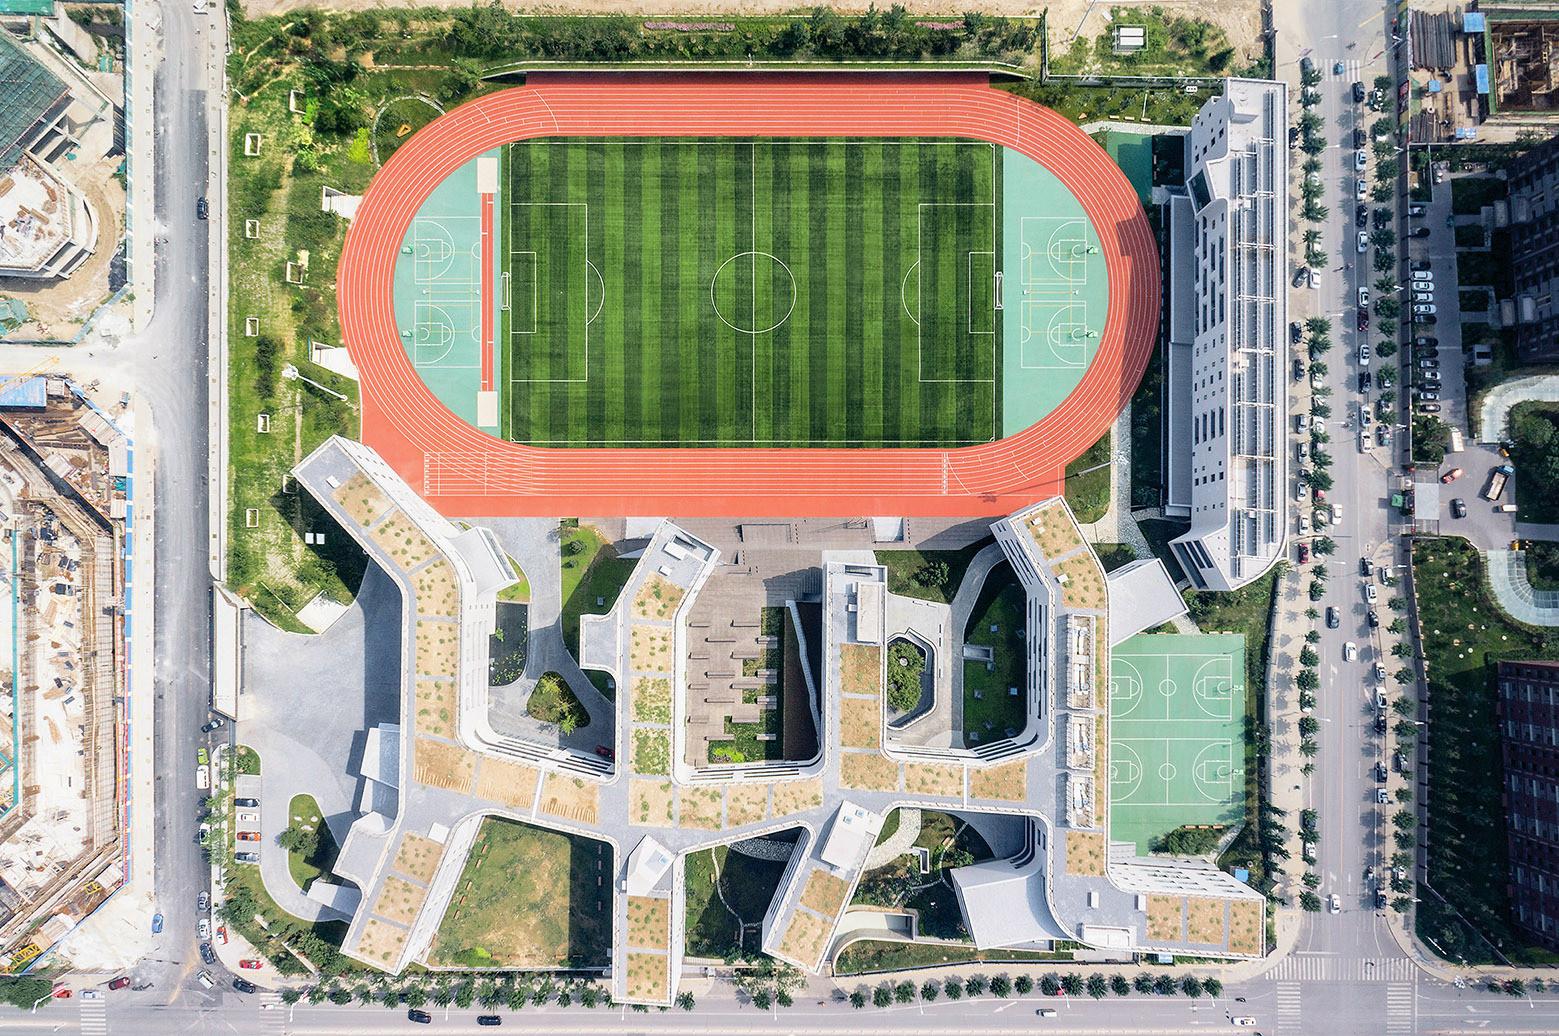 Beijing No.4 Escuela secundaria Fangshan Campus / OPEN Architecture. Imágen © Xia Zhi